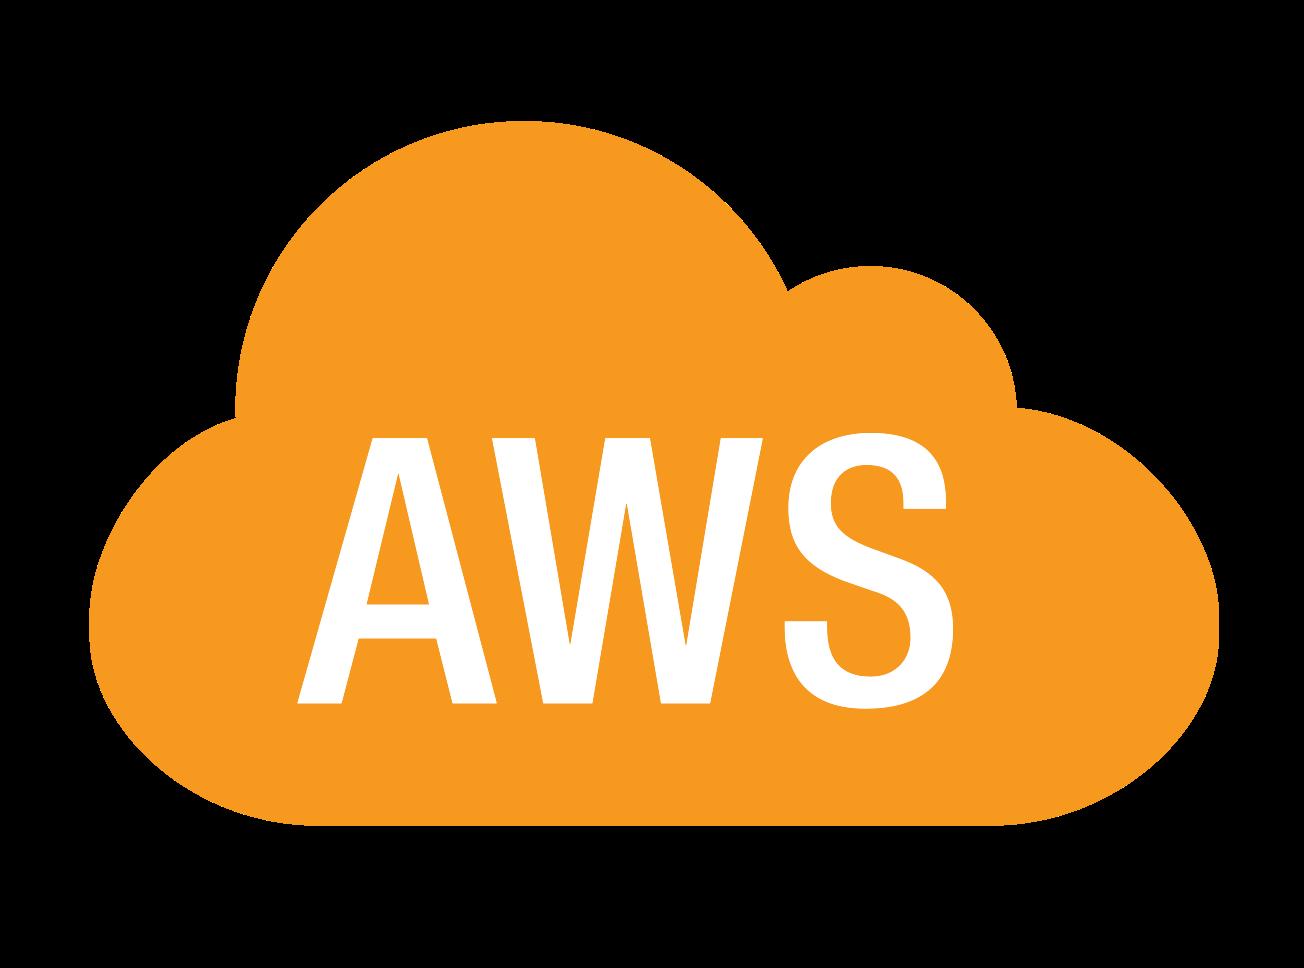 Aws Logo Png Images.